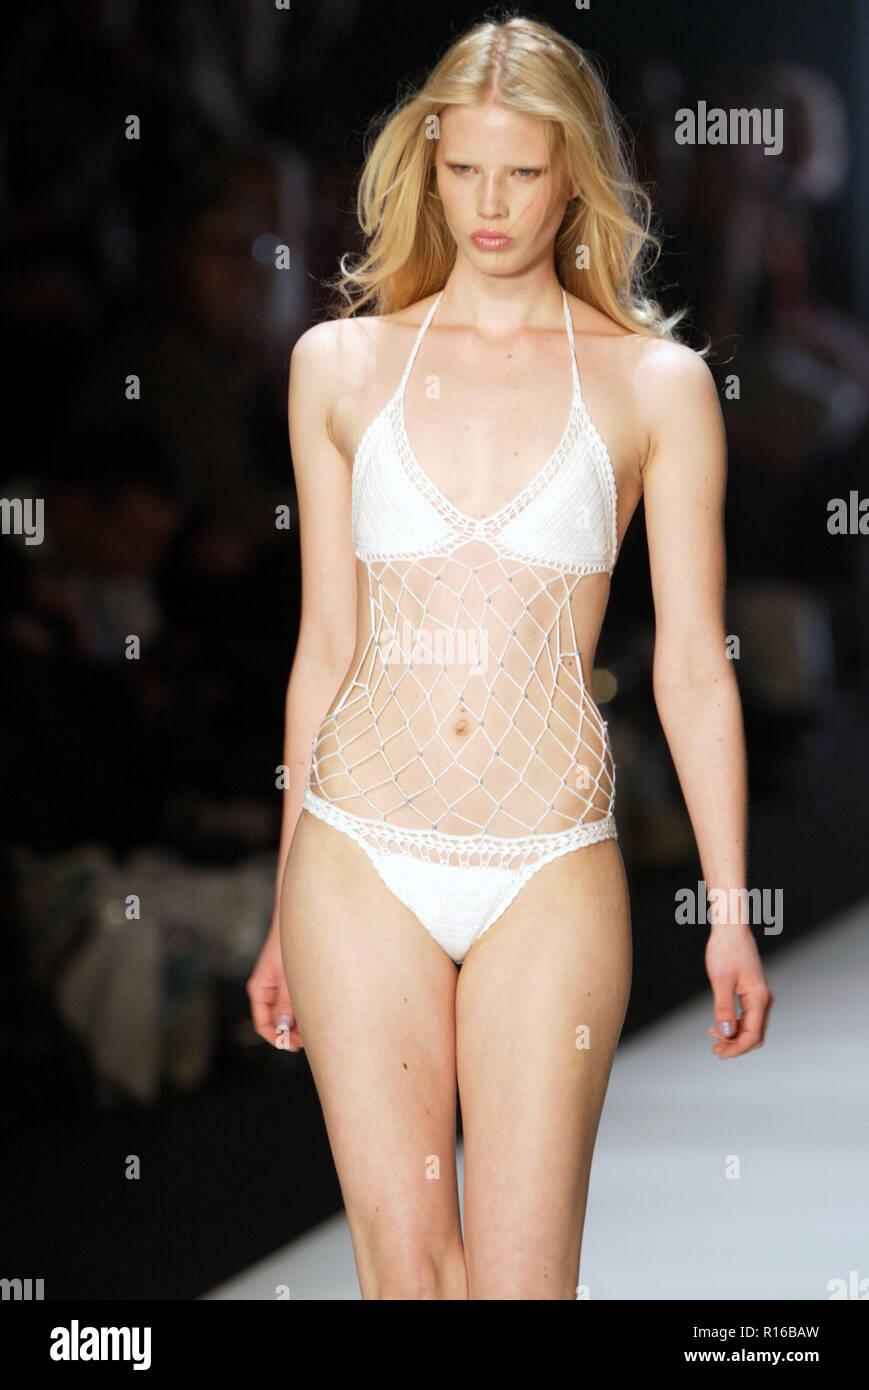 8aef028dcd A mode wears a Kini bikini in the Swimwear Collection Group Show on Day  Three of Australian Fashion Week